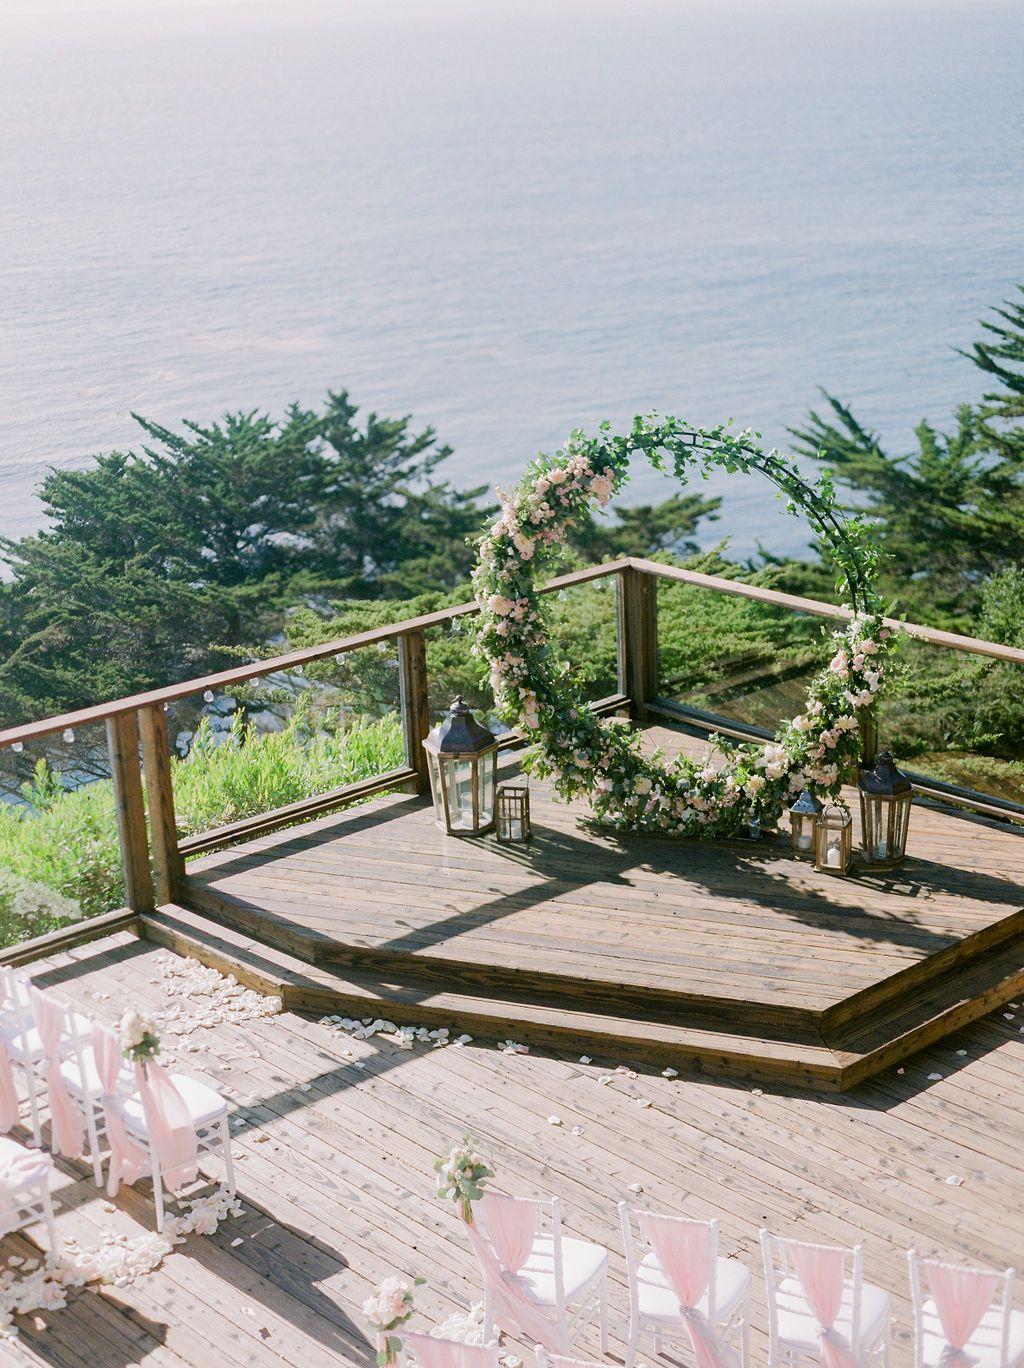 Wedding Ceremony Site At Hyatt Carmel Highlands Event Planning Styling Design Manna Sun Events Photographe Wedding Ceremony Sites Event Planning Event